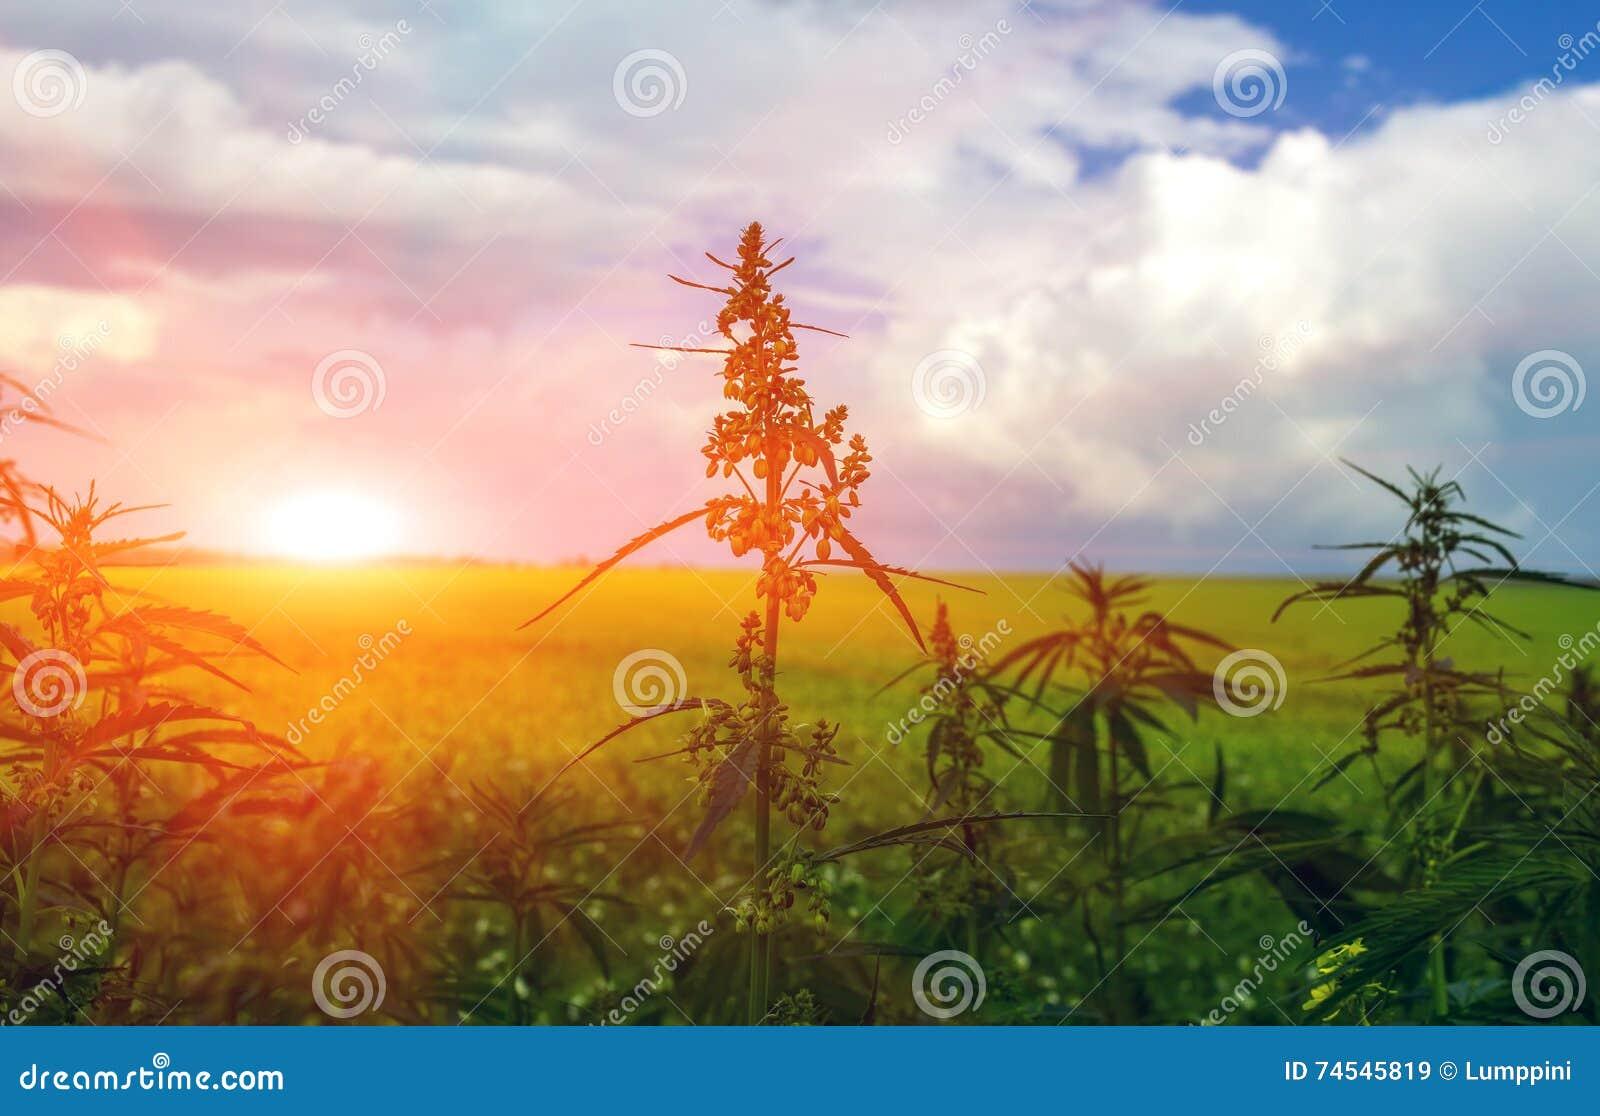 Retail Marijuana Business License Application